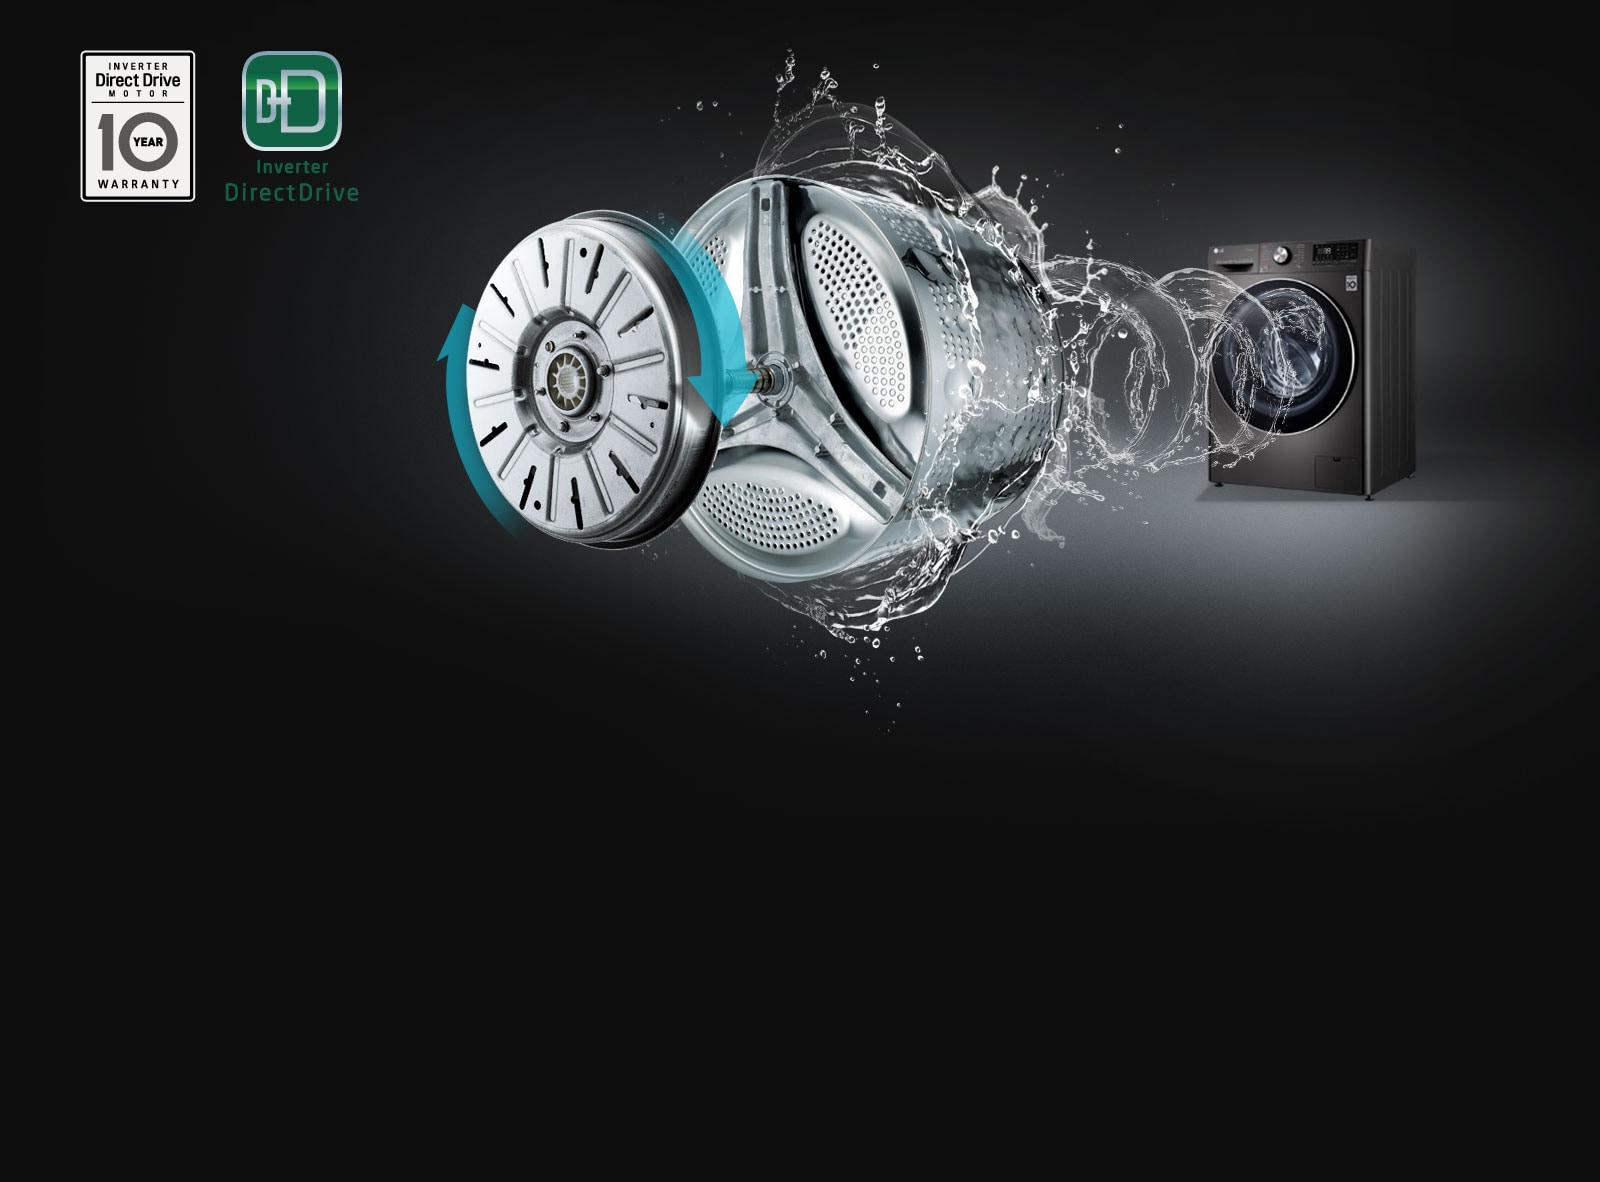 LG FHD1057STB less vibration